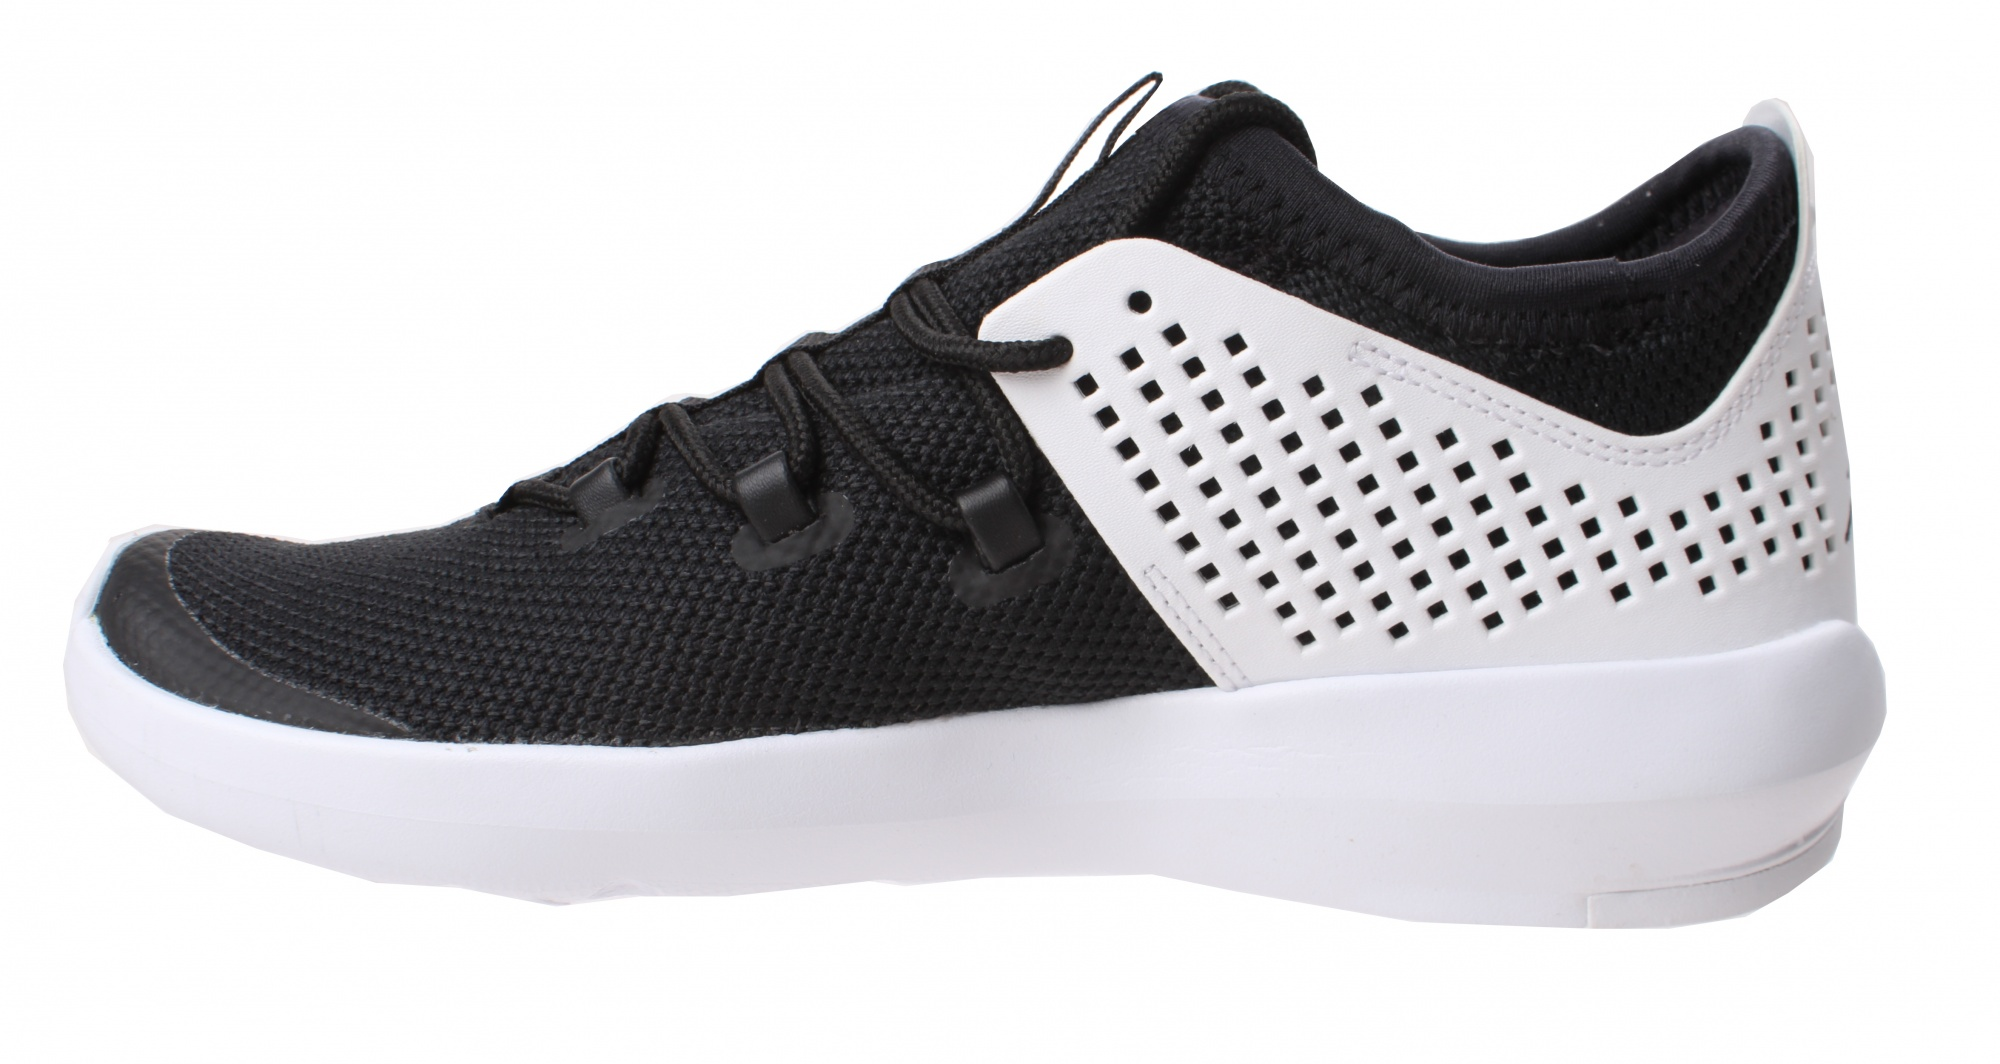 hot sale online 48e99 79ef4 ... Nike sneakers Jordan Eclipse Express men black  white ...